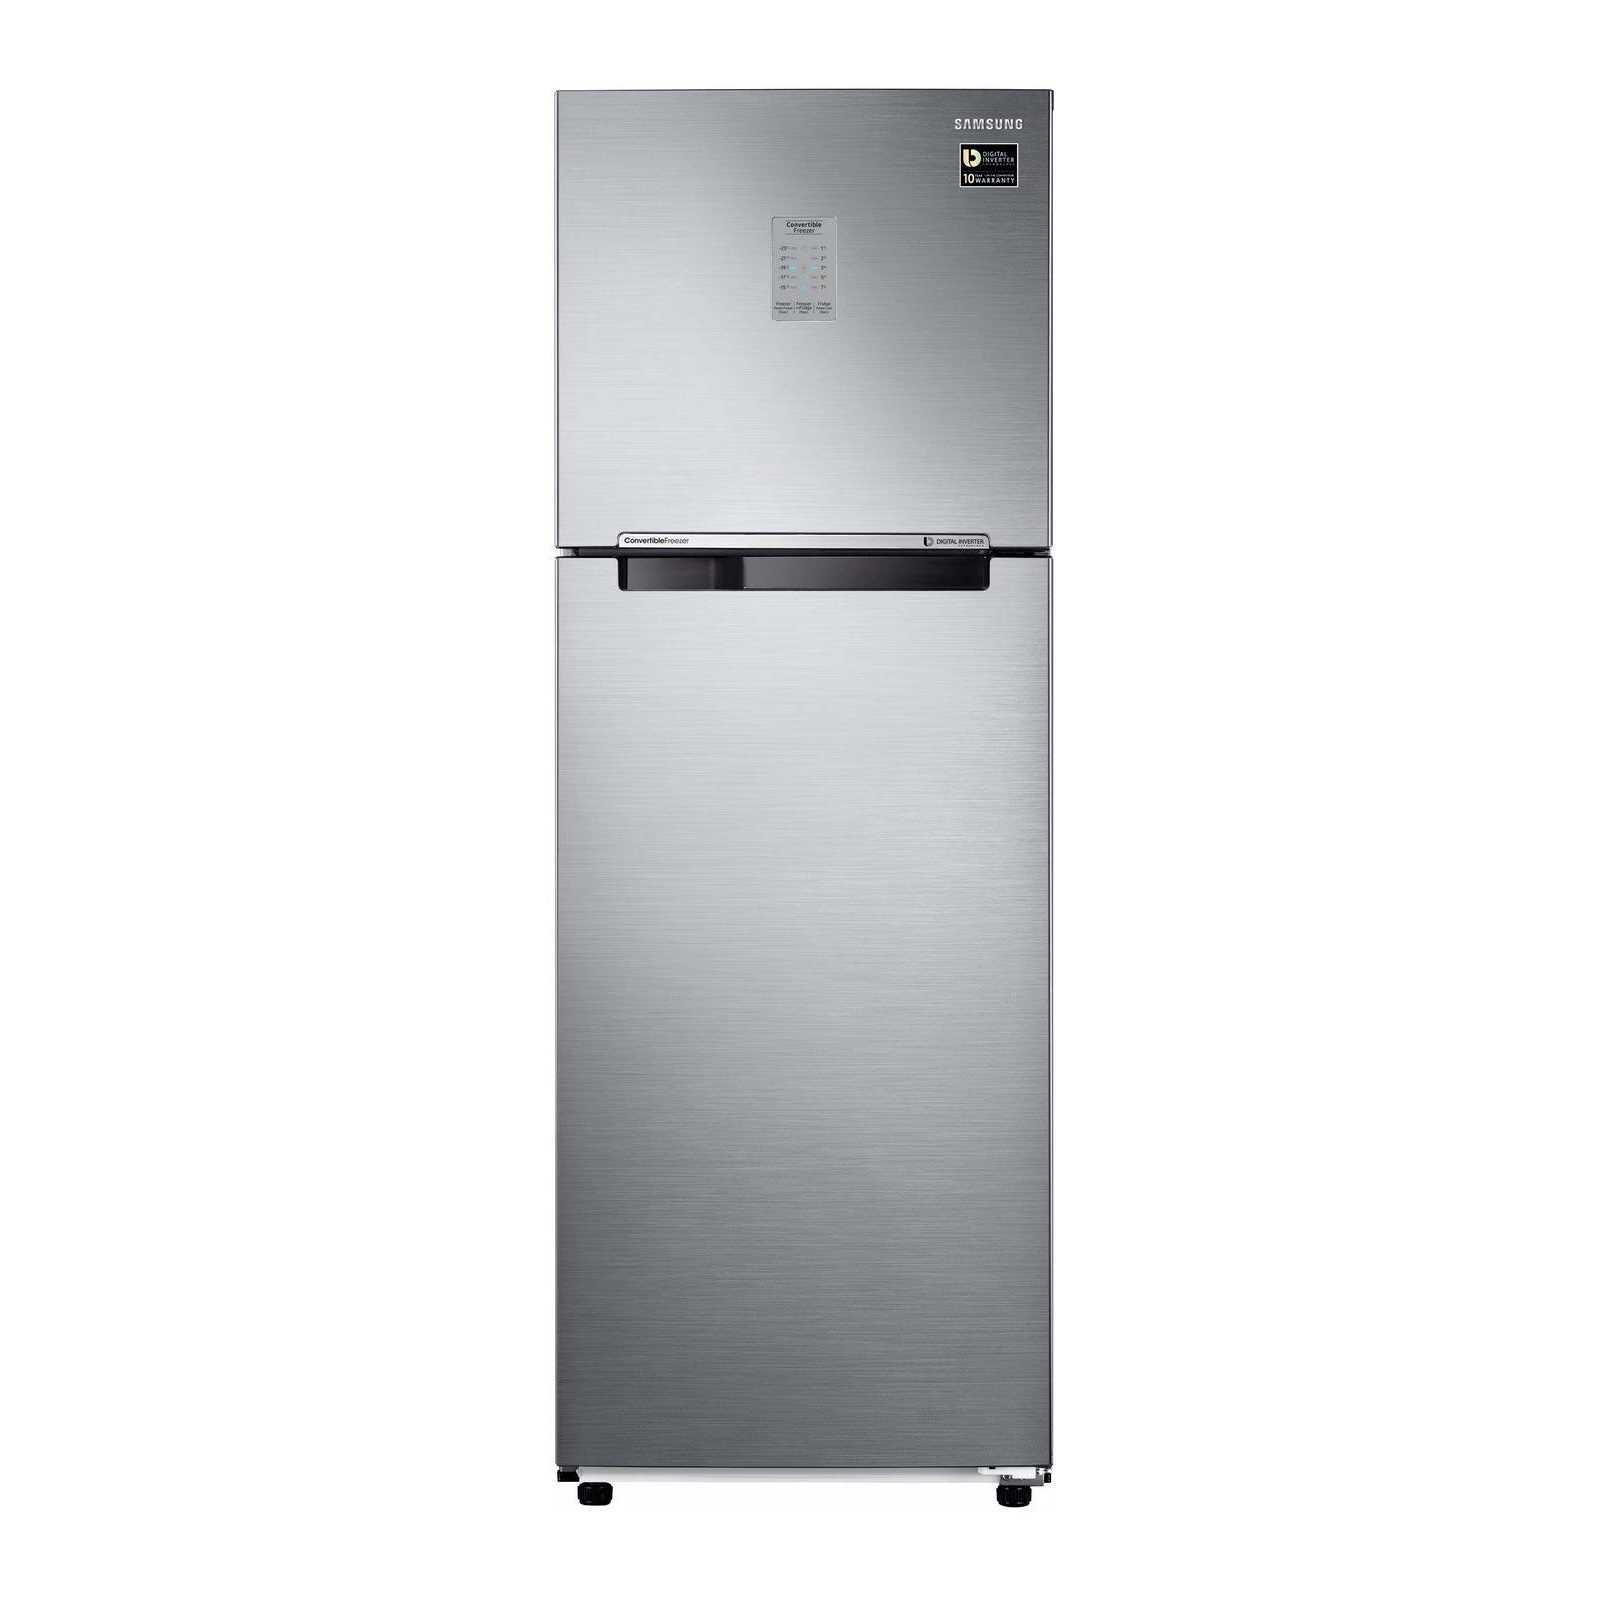 Samsung RT30N3753SL HL 275 Litres Frost Free Double Door Refrigerator